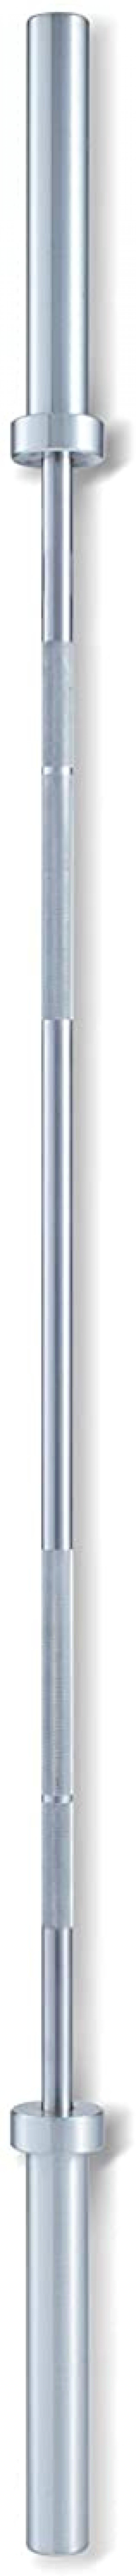 2.2m Int'l Hard Chrome Bar, 380kg Test - 32 mm, Silver